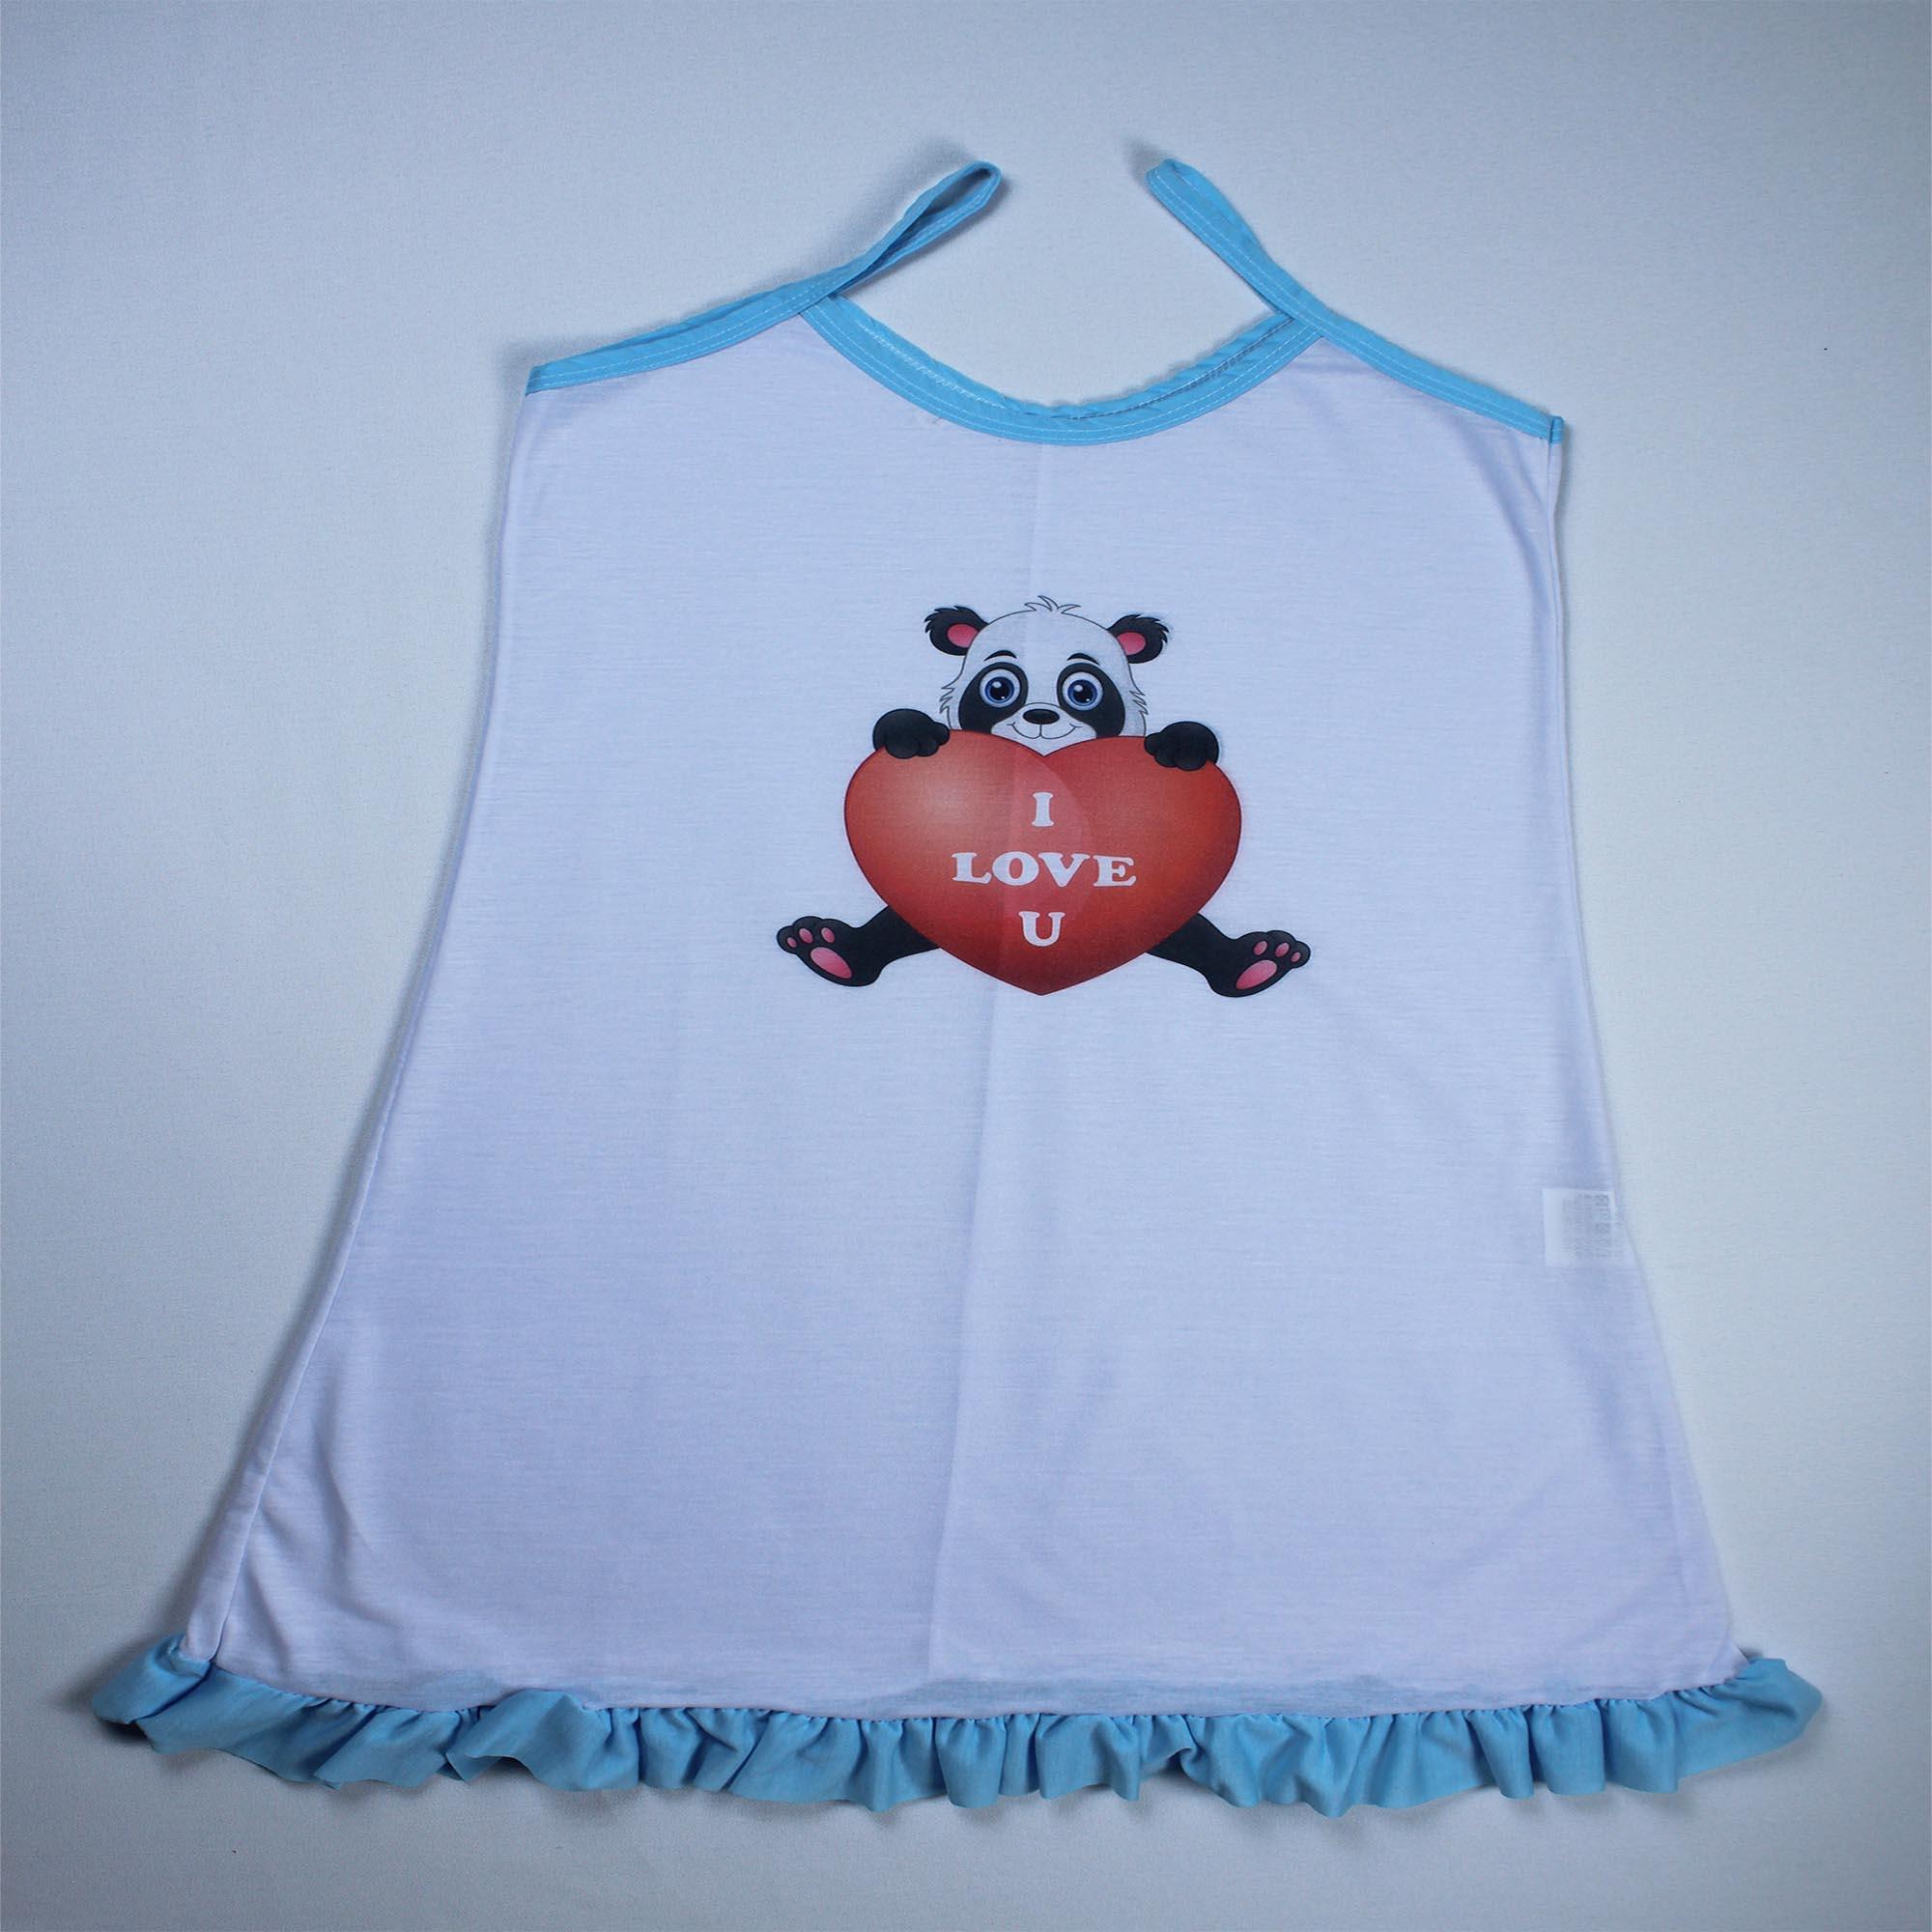 Camisola Regata Infantil Menina - Tamanho 12